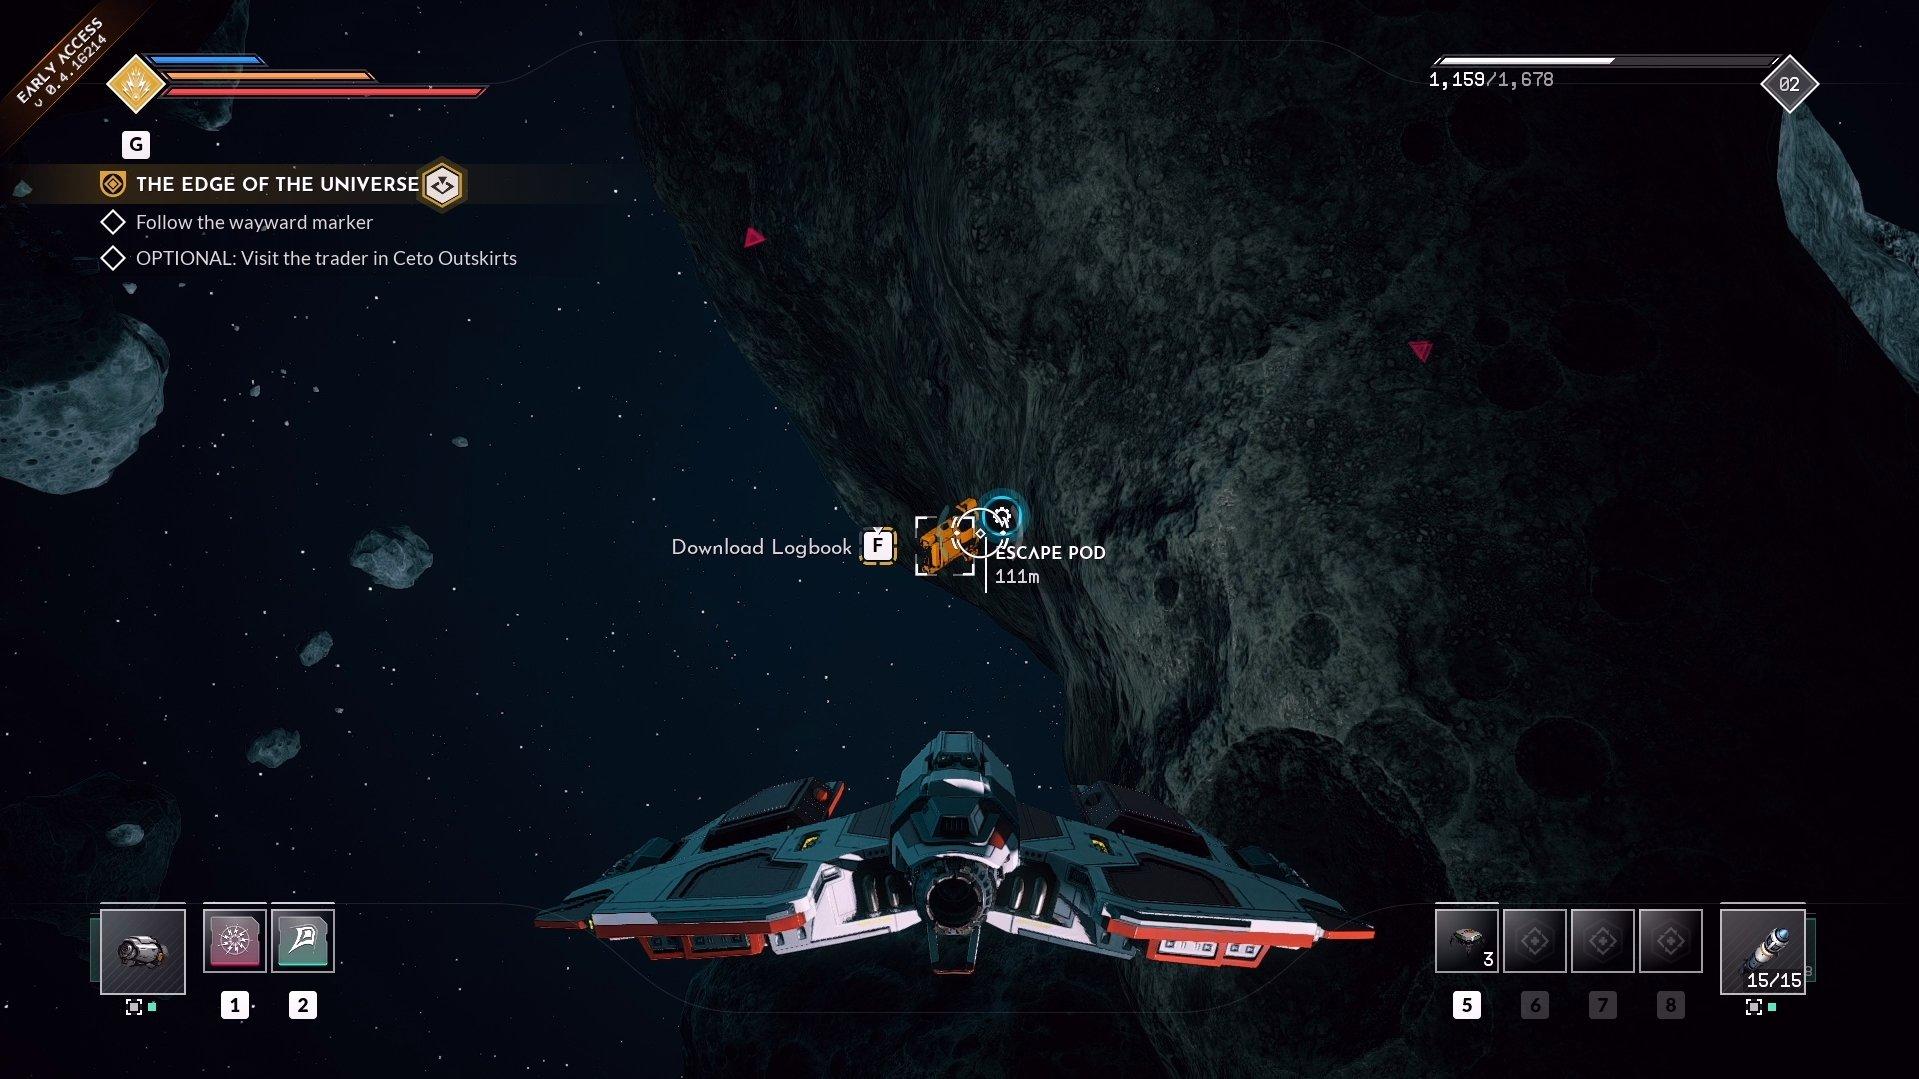 The Edge of the Universe Walkthrough 6